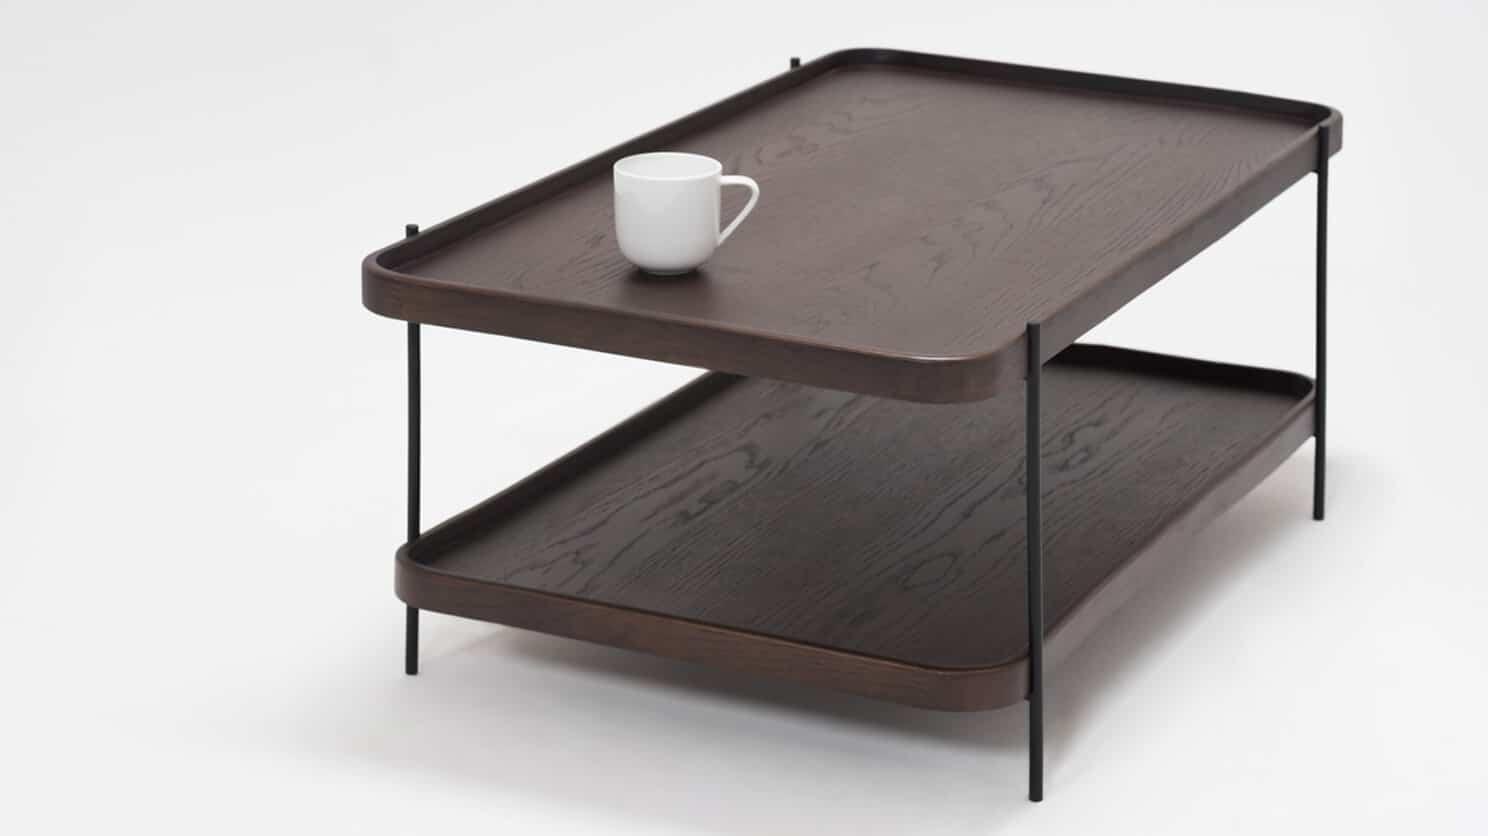 3020 419 17 5 coffee tables sage rectangular coffee table smoked oak detail 01